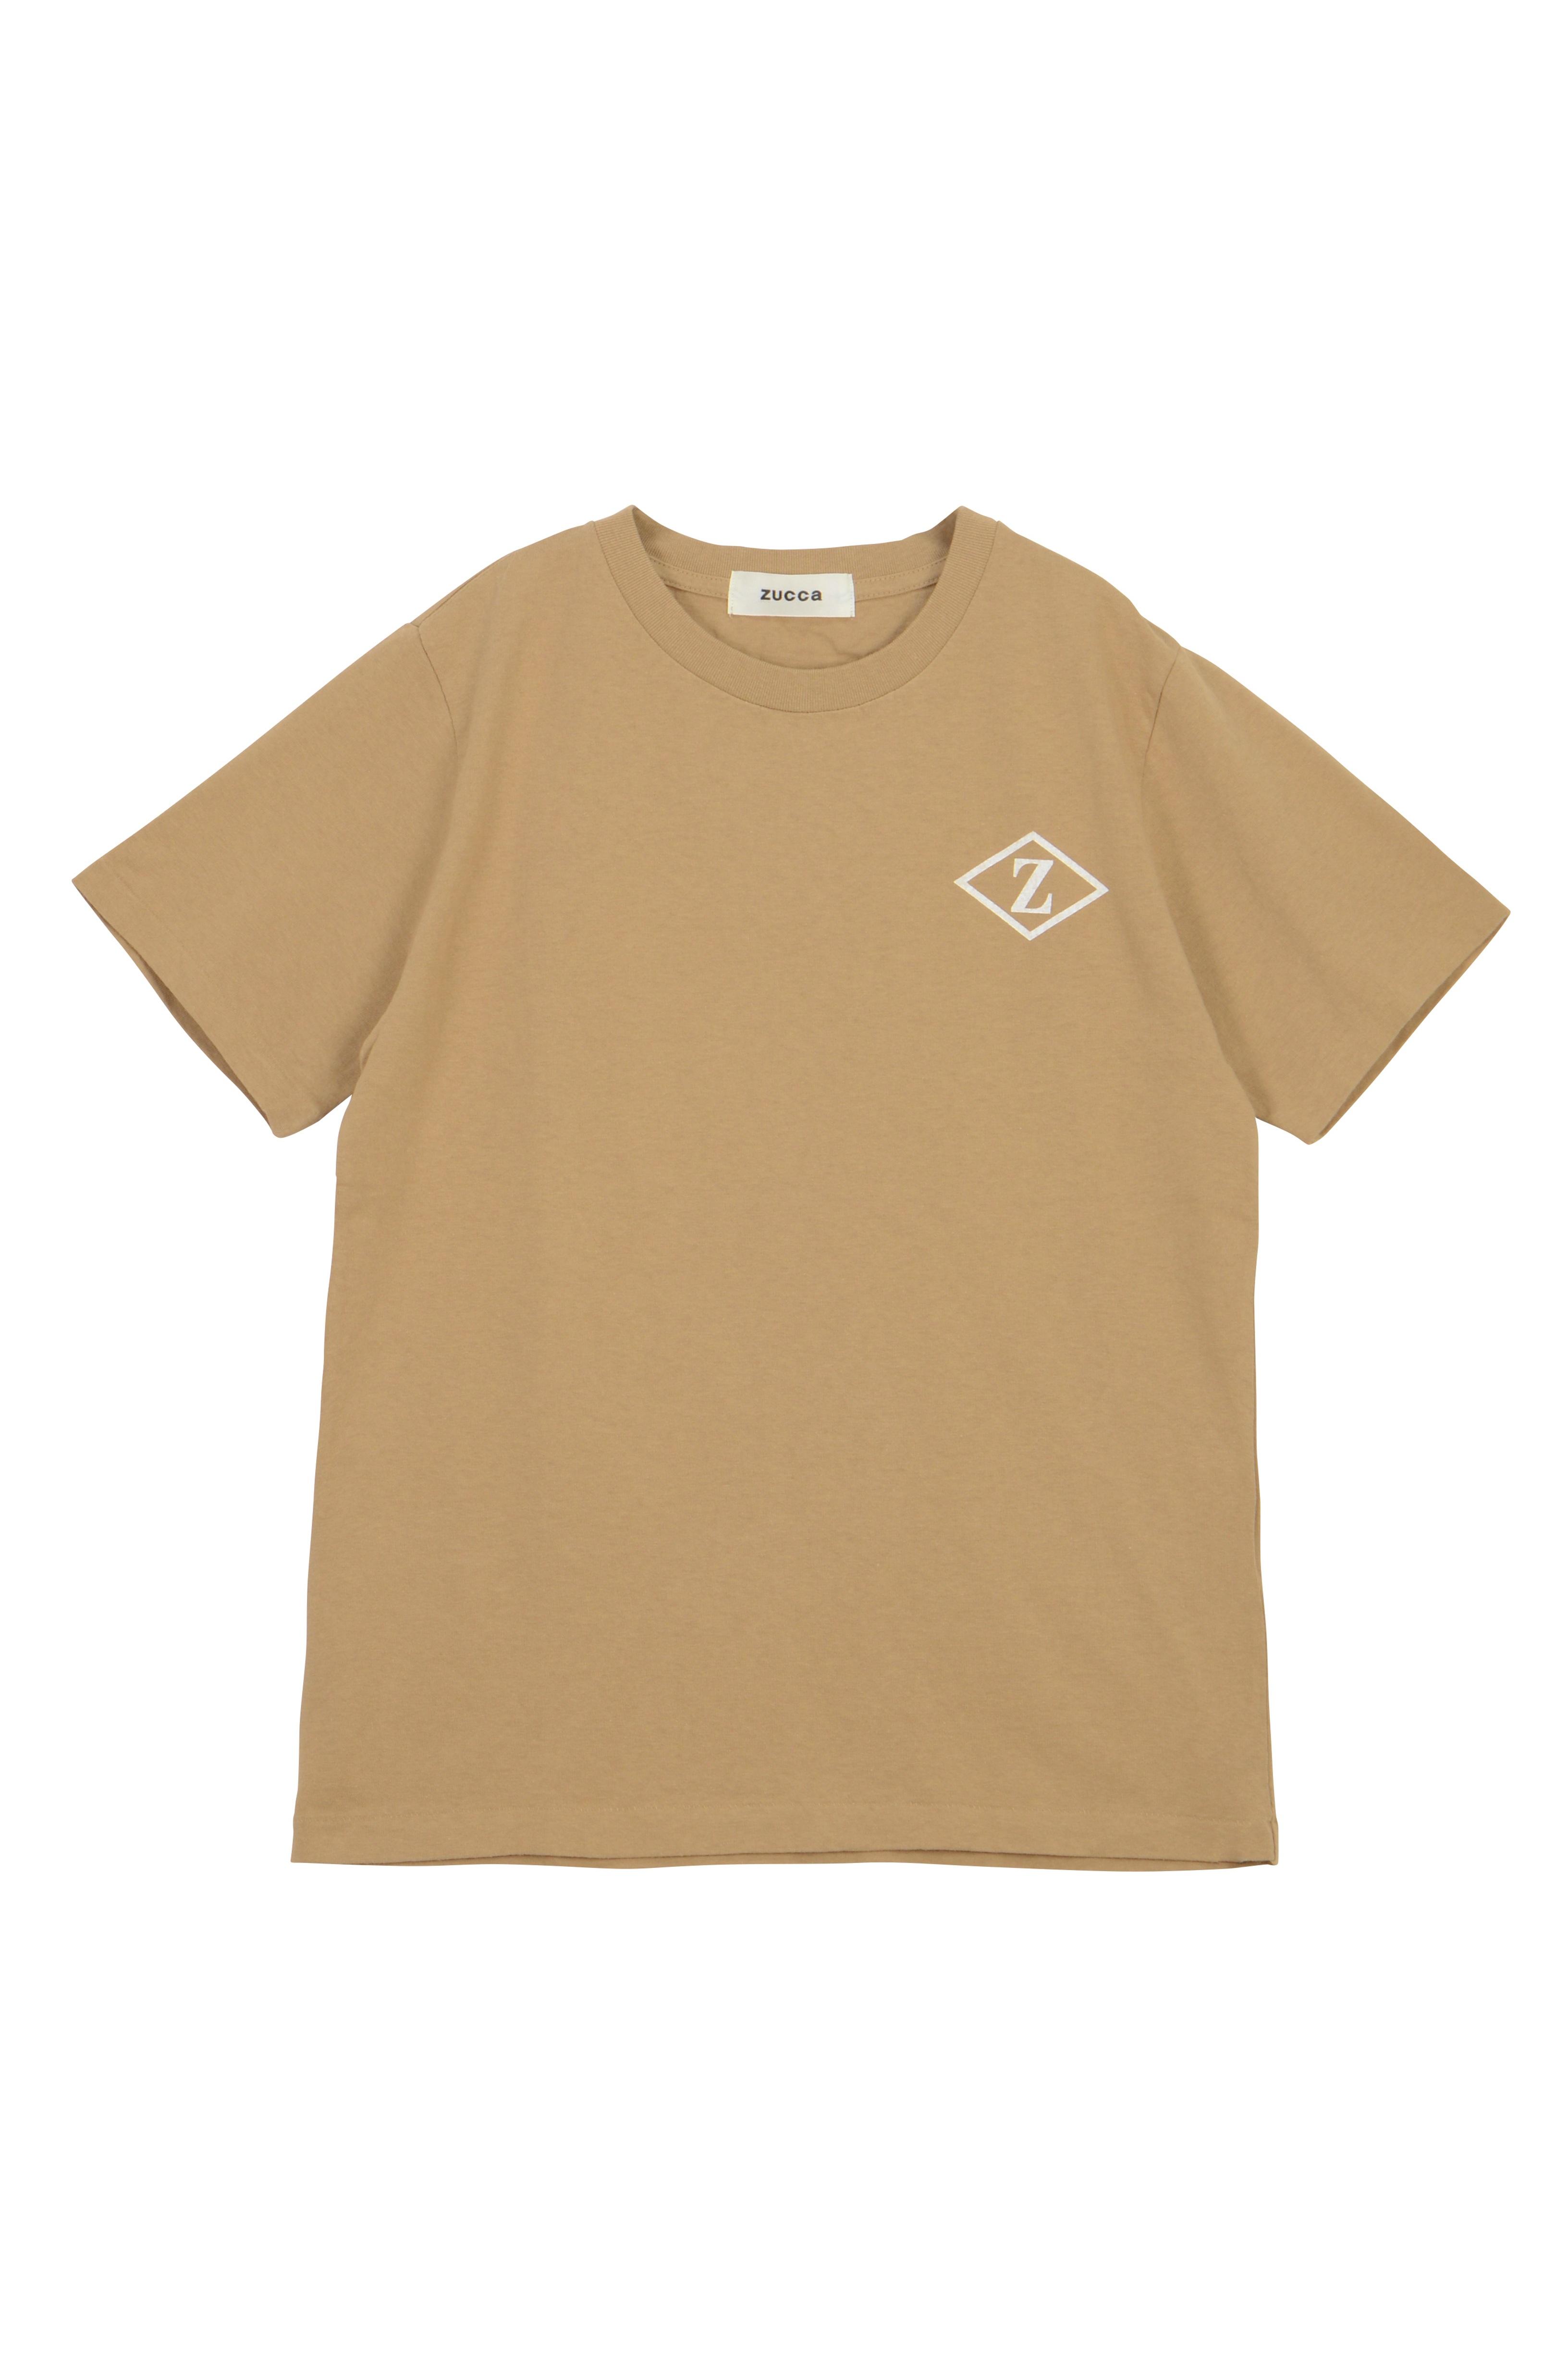 (30)Z_ICON Tシャツ / Tシャツ ベージュ